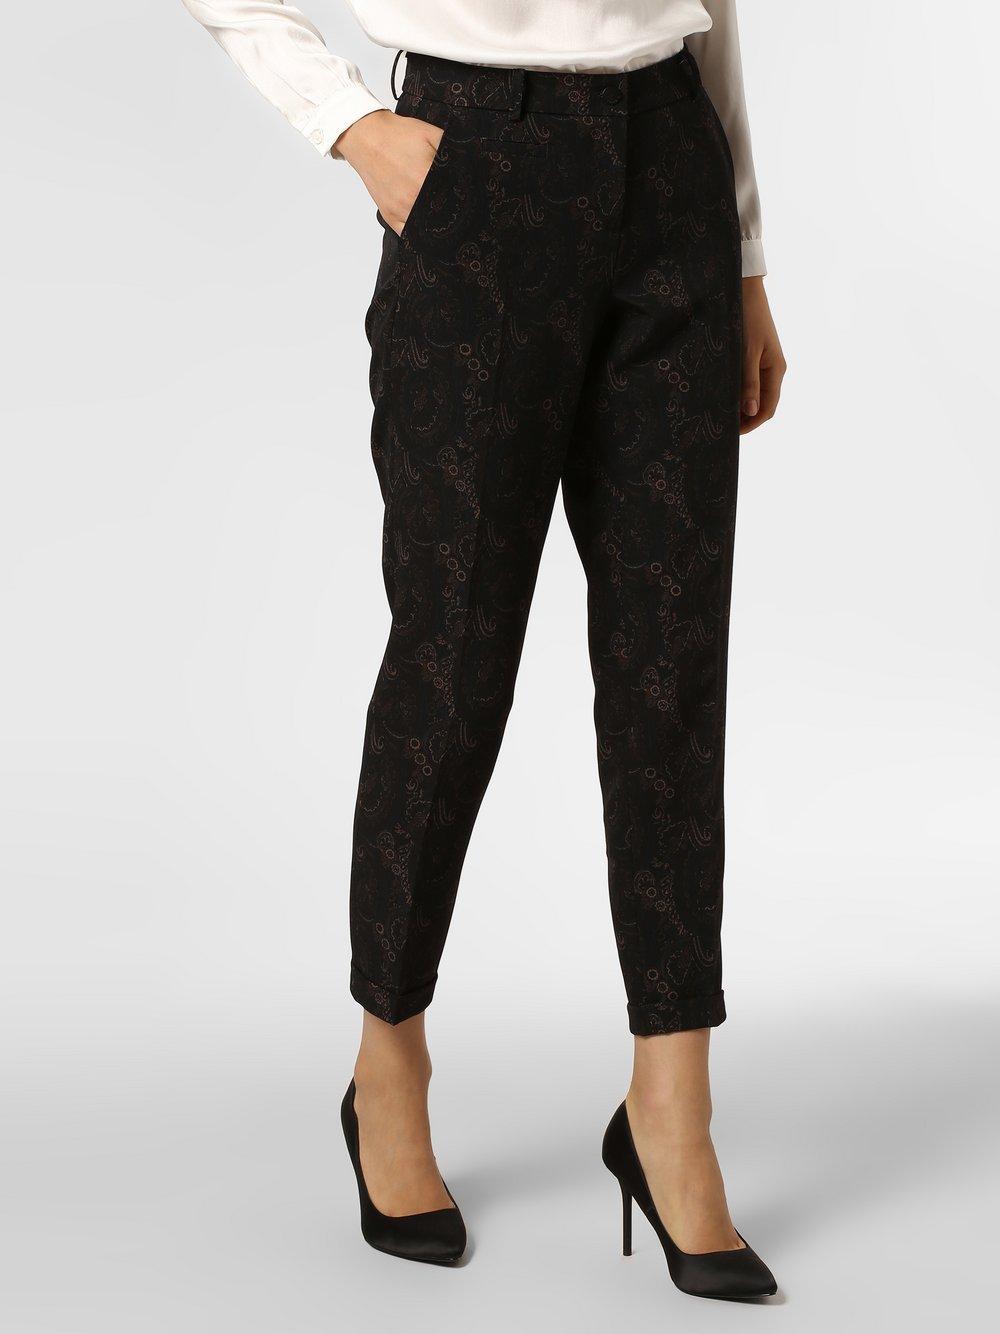 Cambio - Spodnie damskie – Stella, czarny